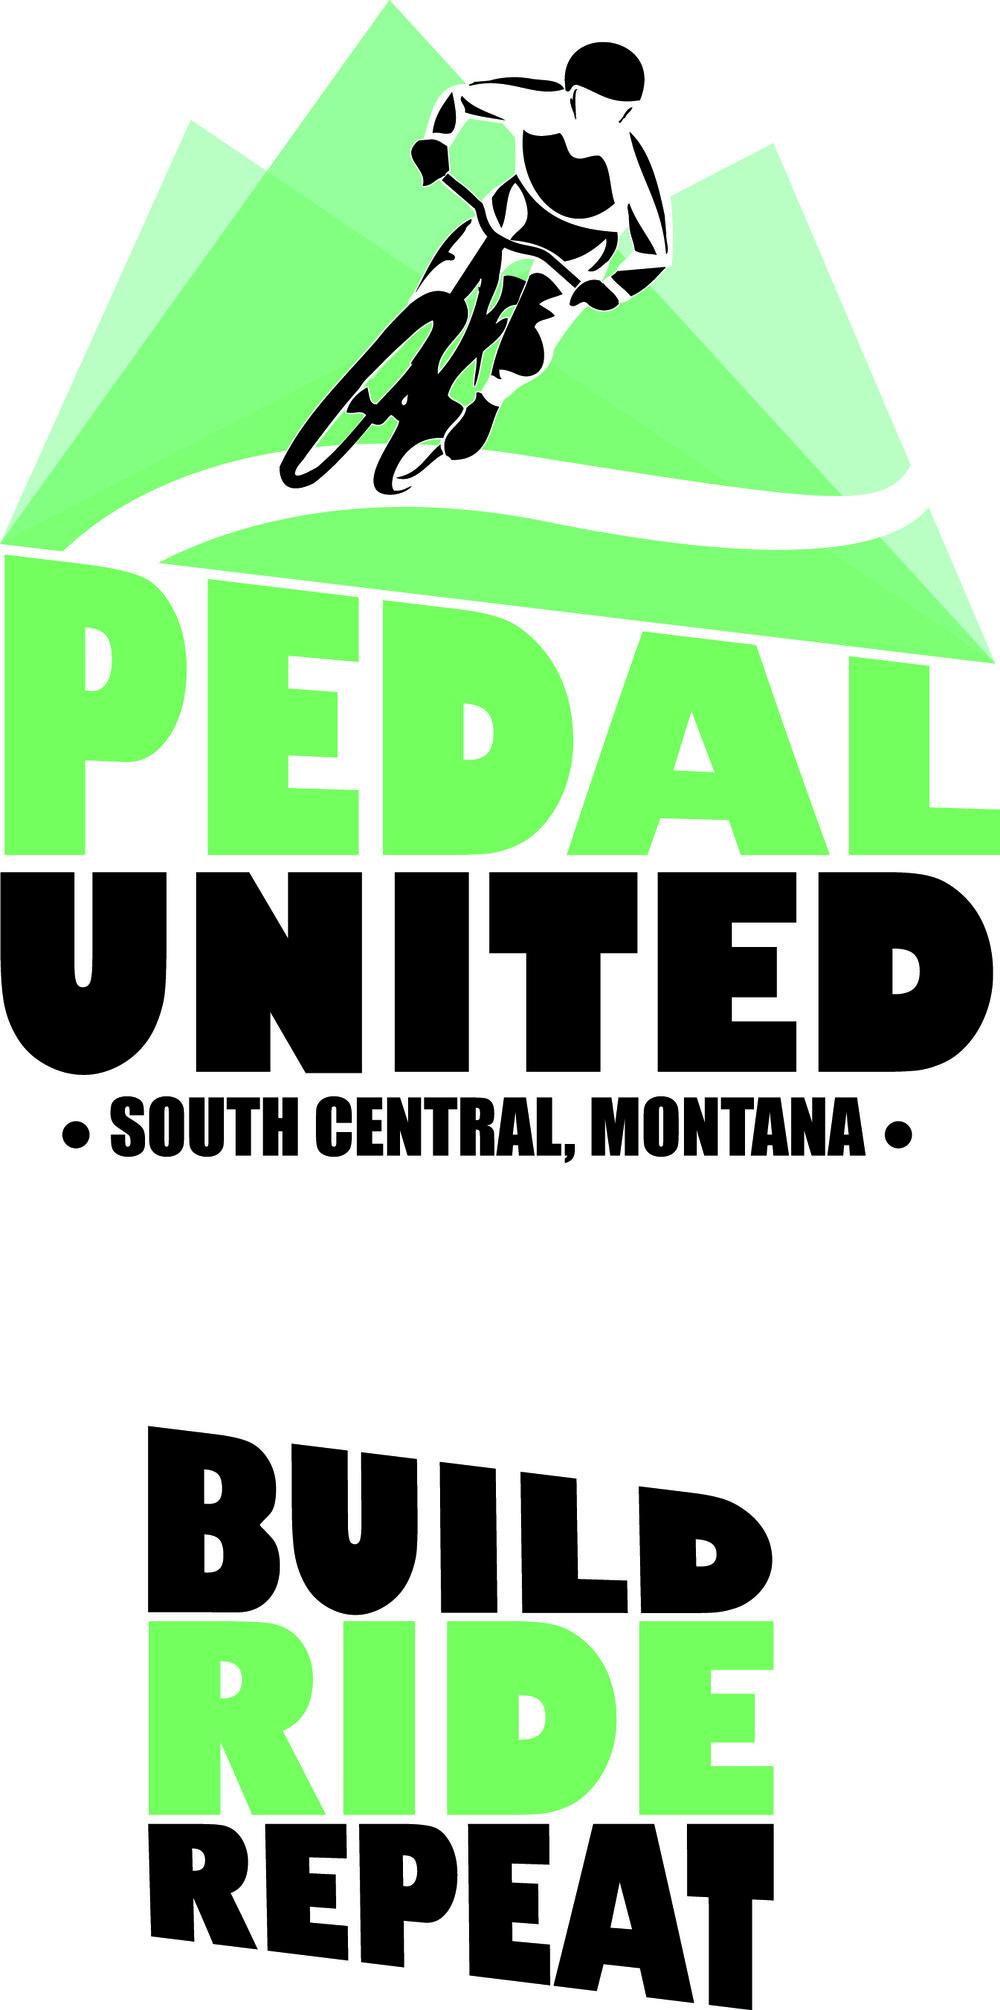 Pedal United logo 2016.jpg